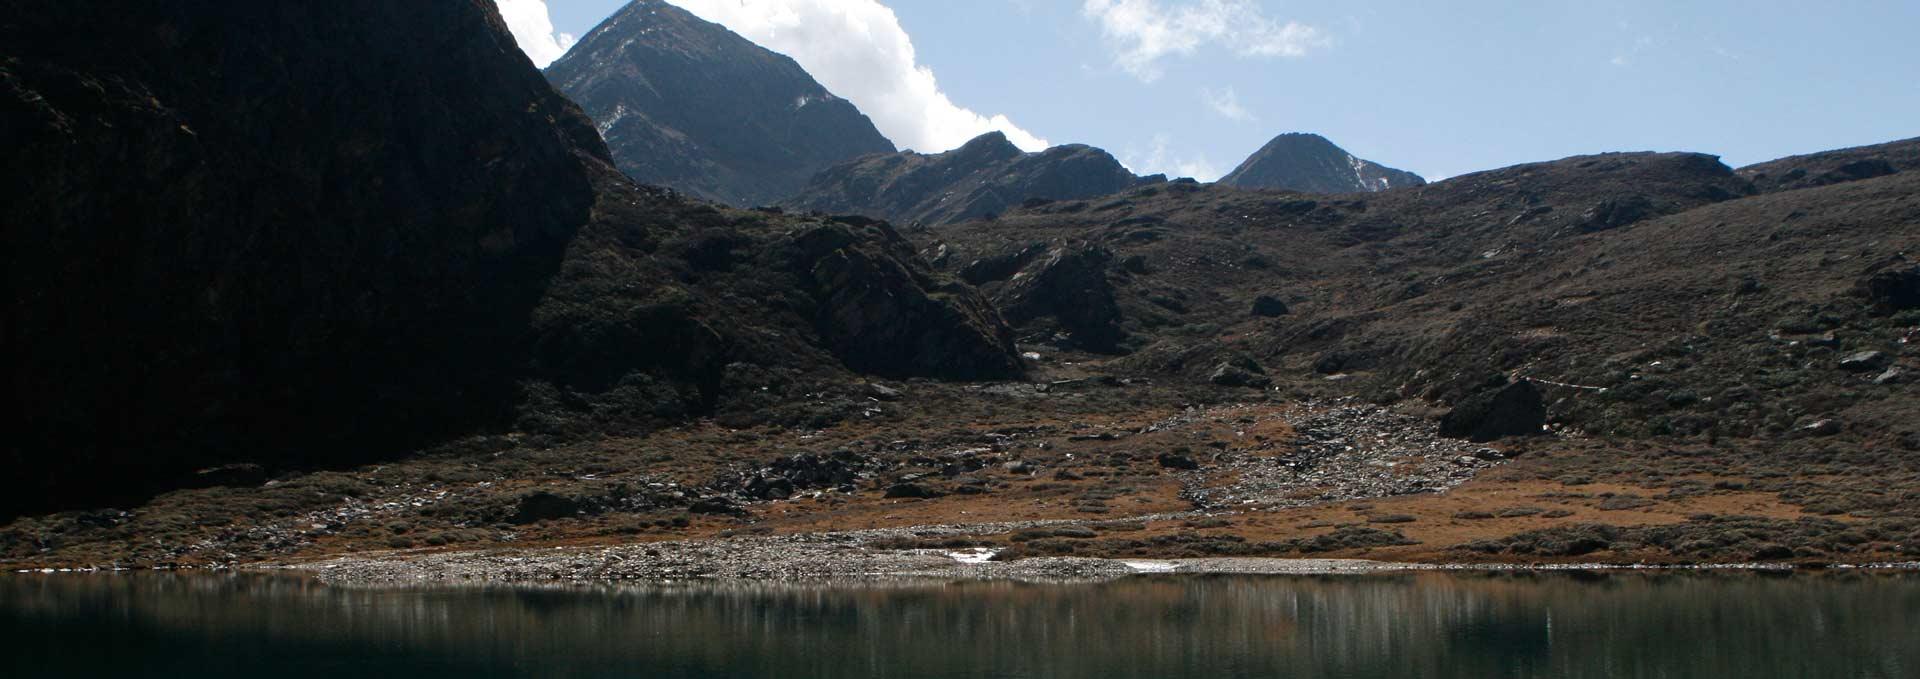 Phajoding Ghoenpa – A Day Hike in Thimphu